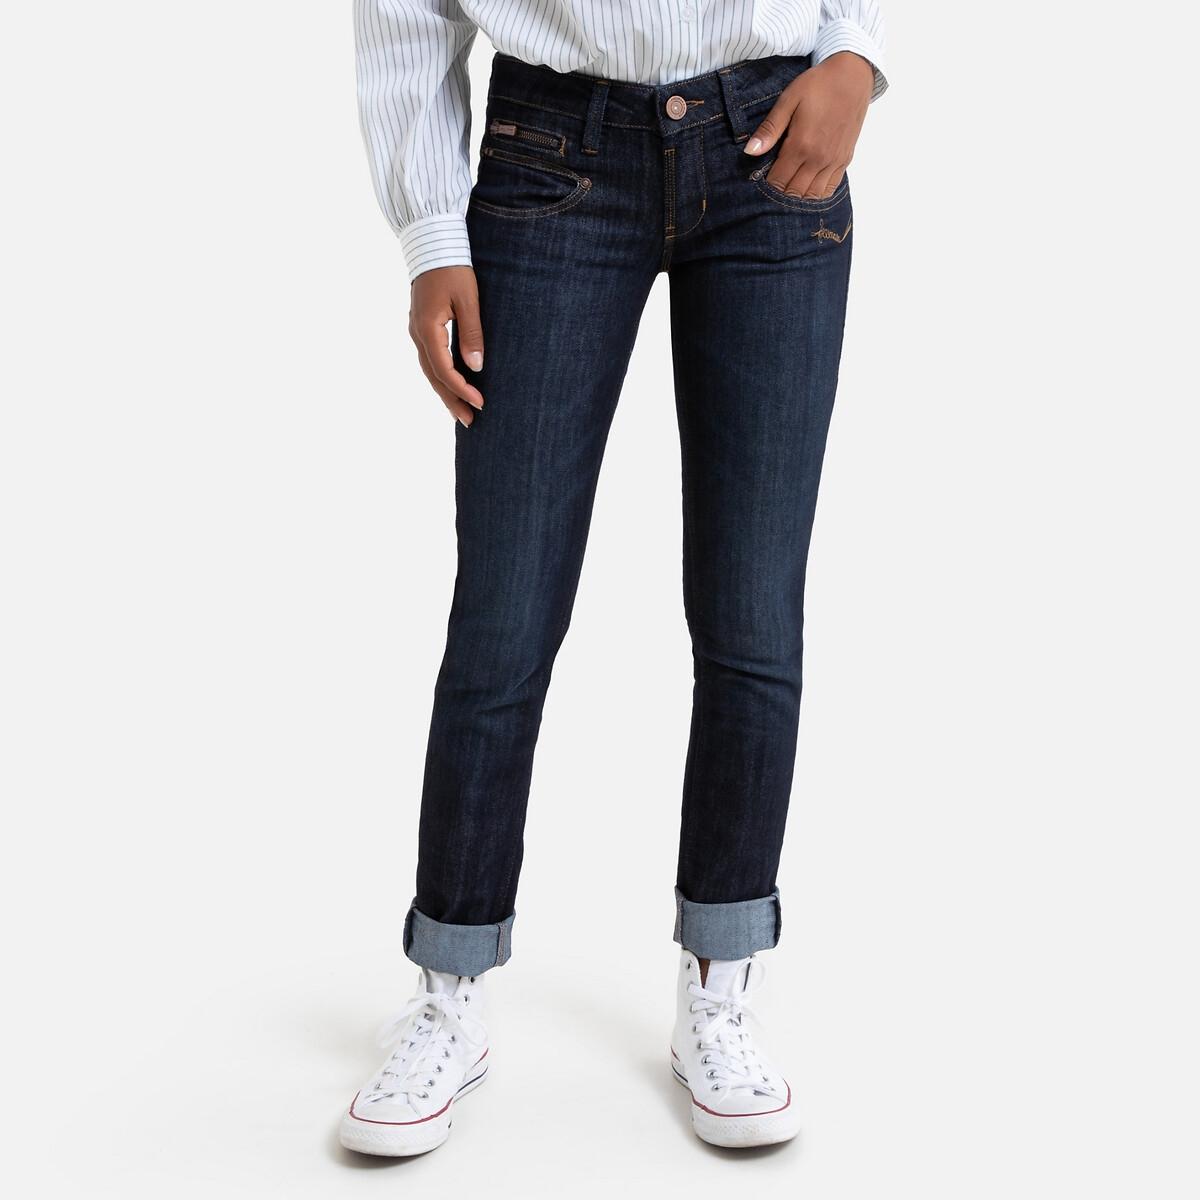 FREEMAN T. PORTER - Freeman T. Porter Jeans Alexa Slim SDM